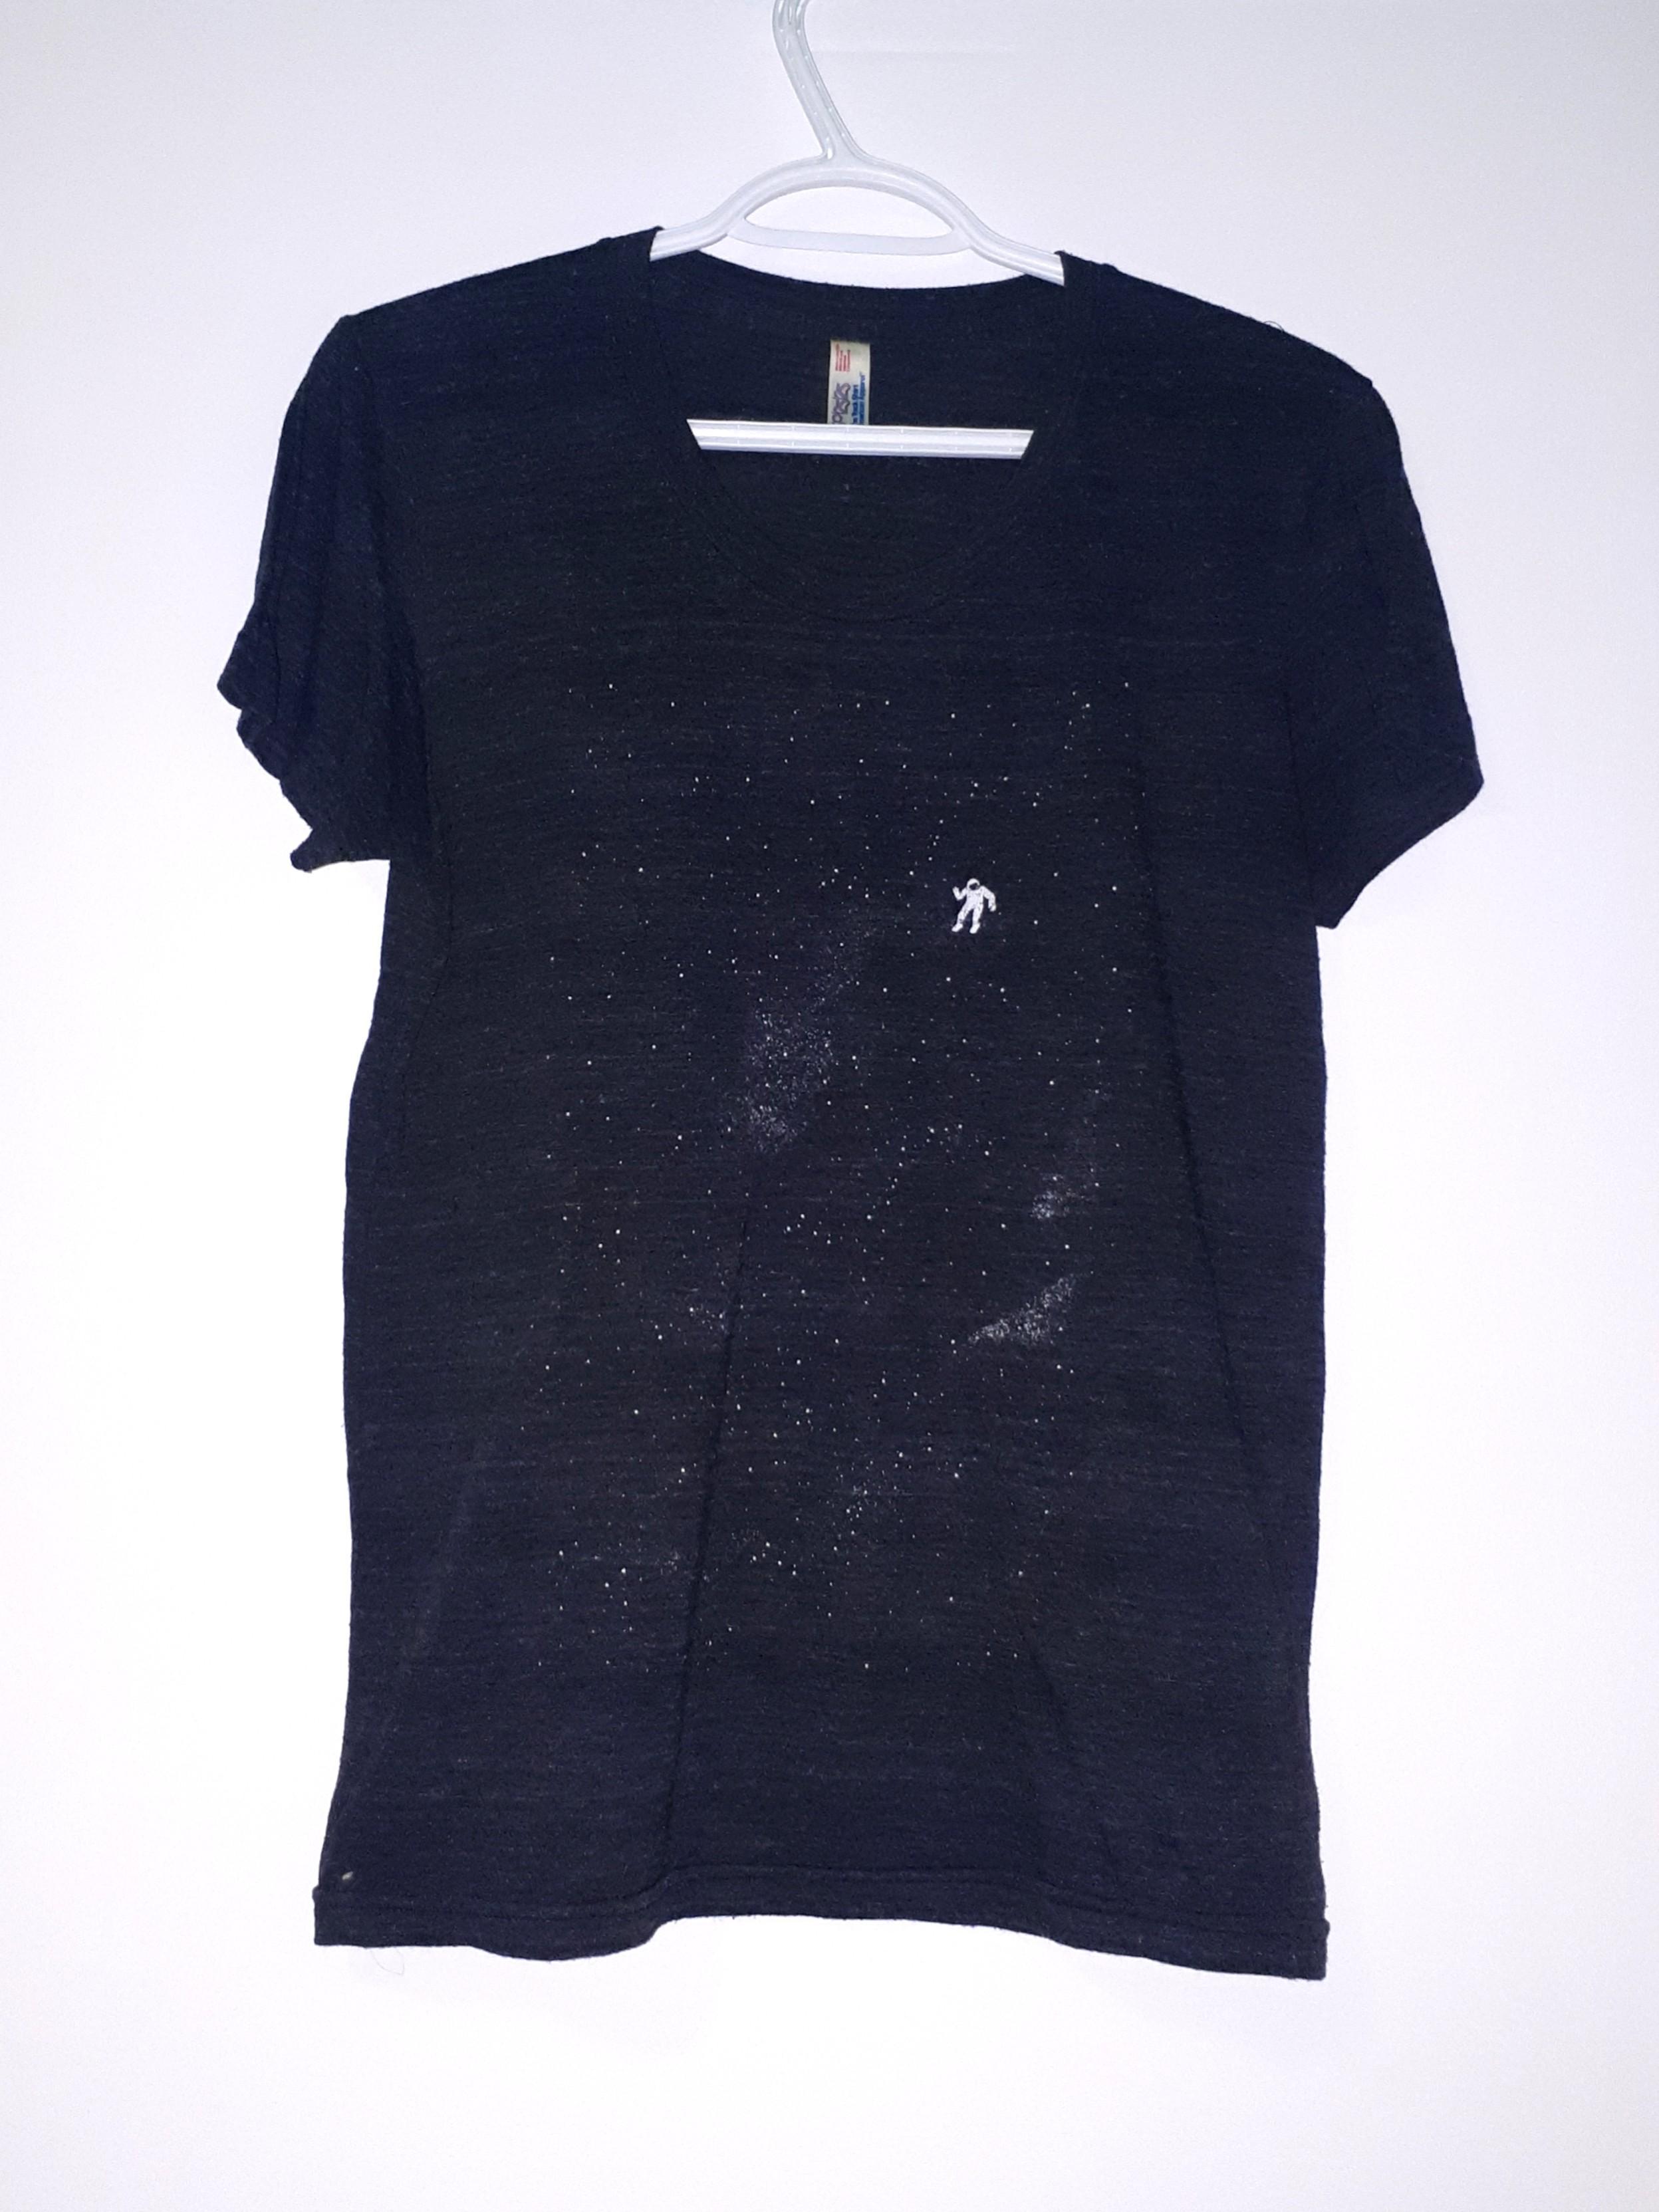 American Aparrel tshirt